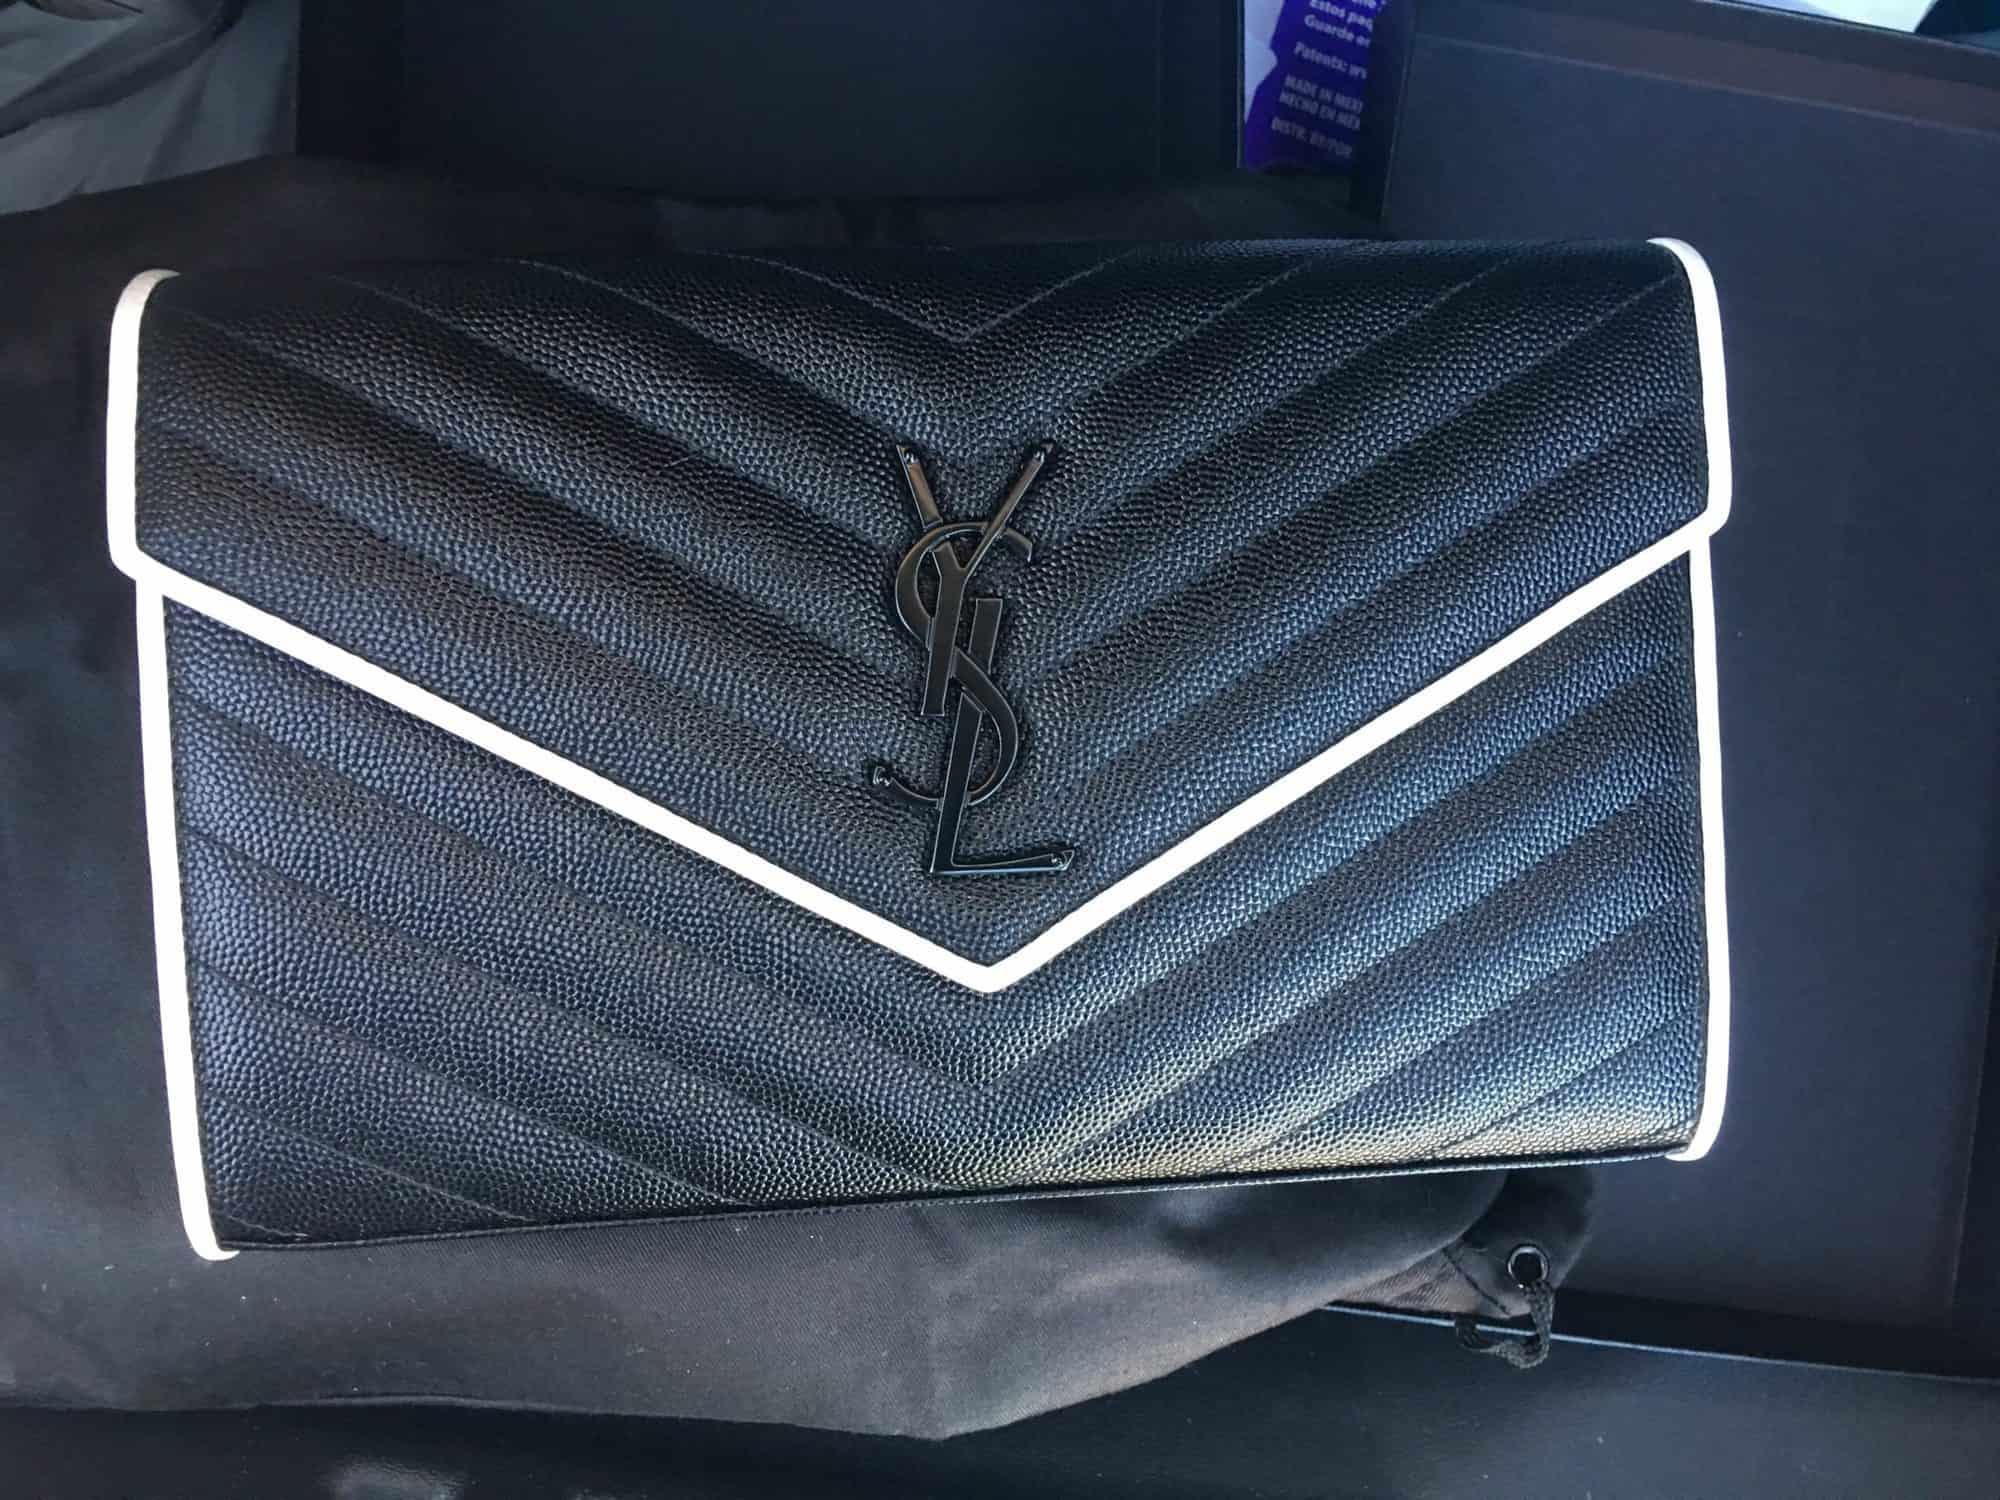 The most expensive handbag brands - Saint Laurent